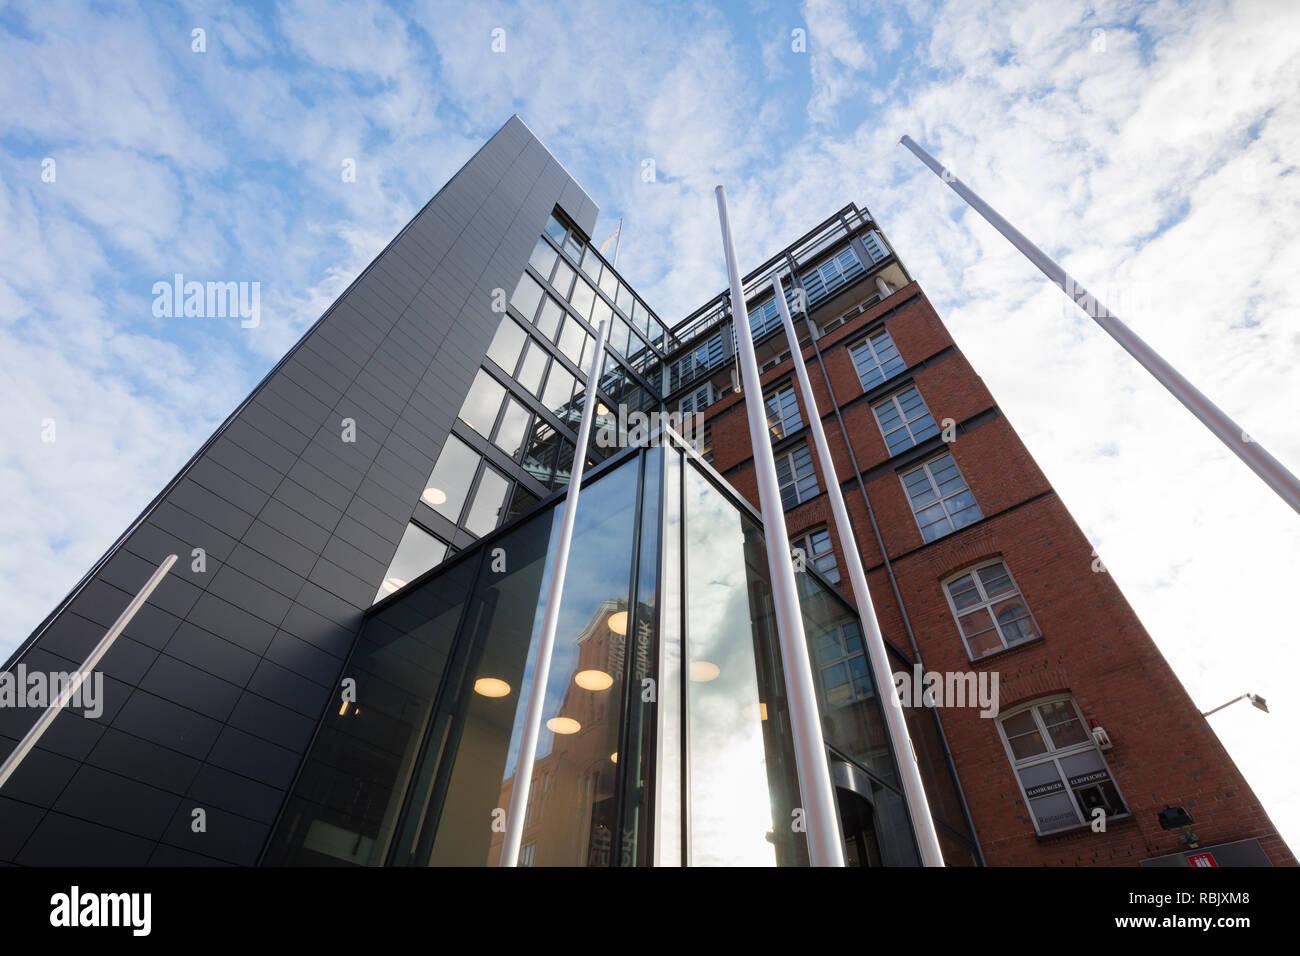 Immeuble de bureaux, Elbspeicher, Stilwerk, Altona, Hambourg, Allemagne, Europe Banque D'Images